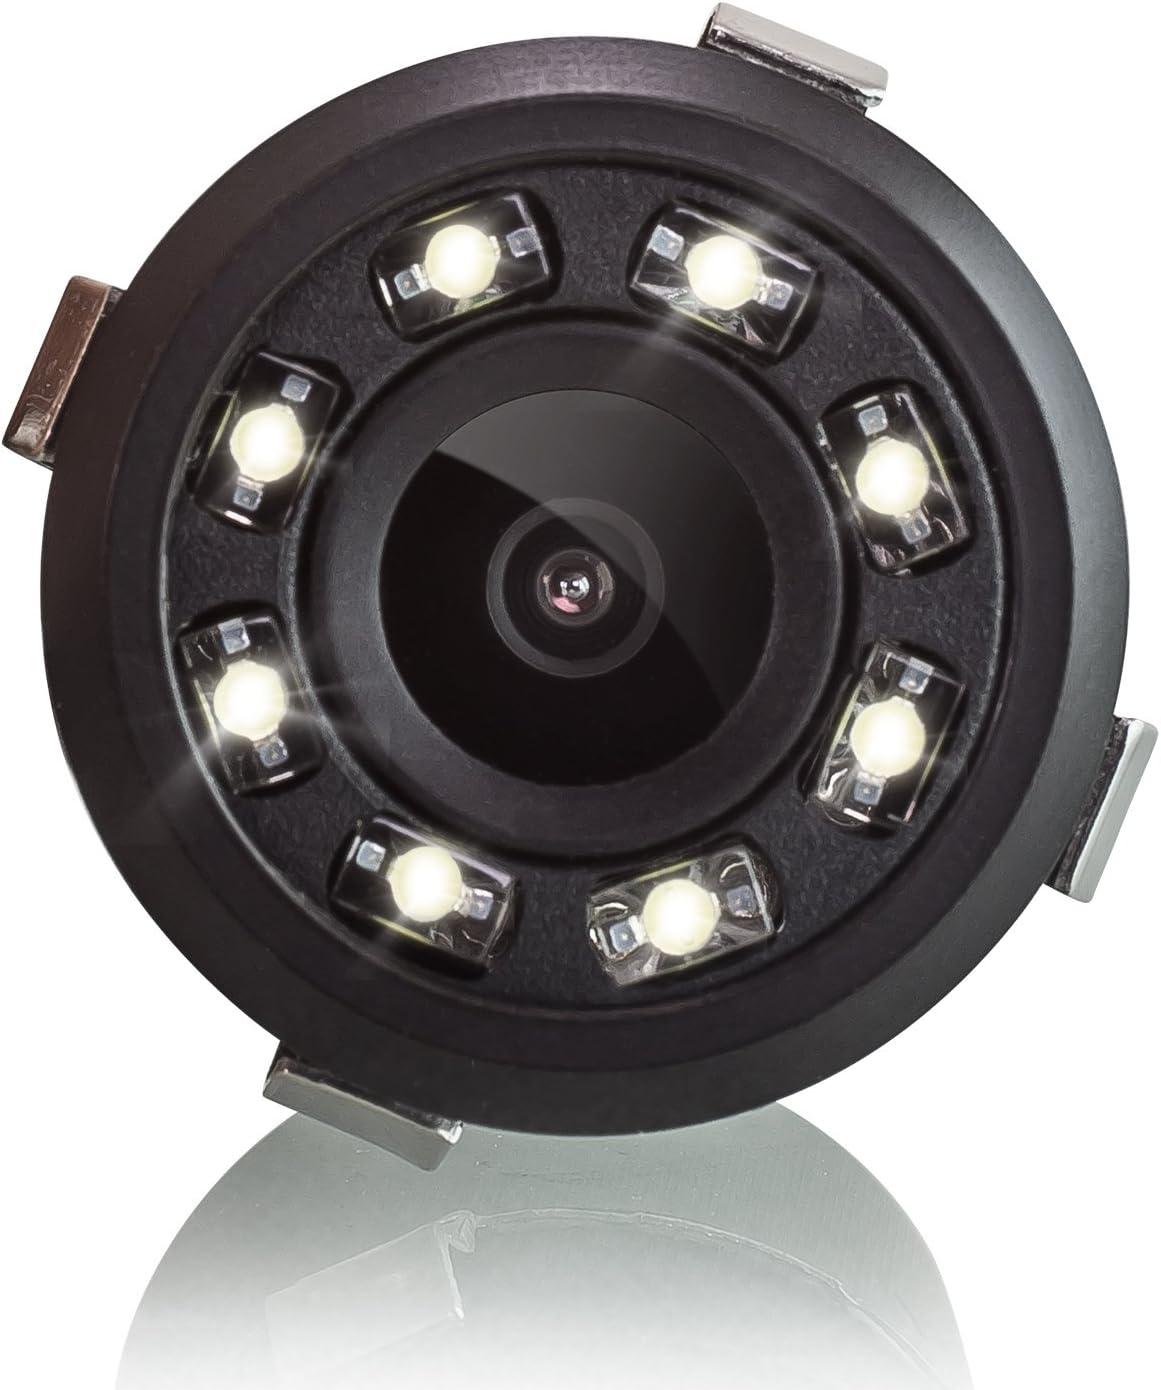 Xomax Xm 018 Universal Auto Rückfahrkamera Set Mit 8 Elektronik